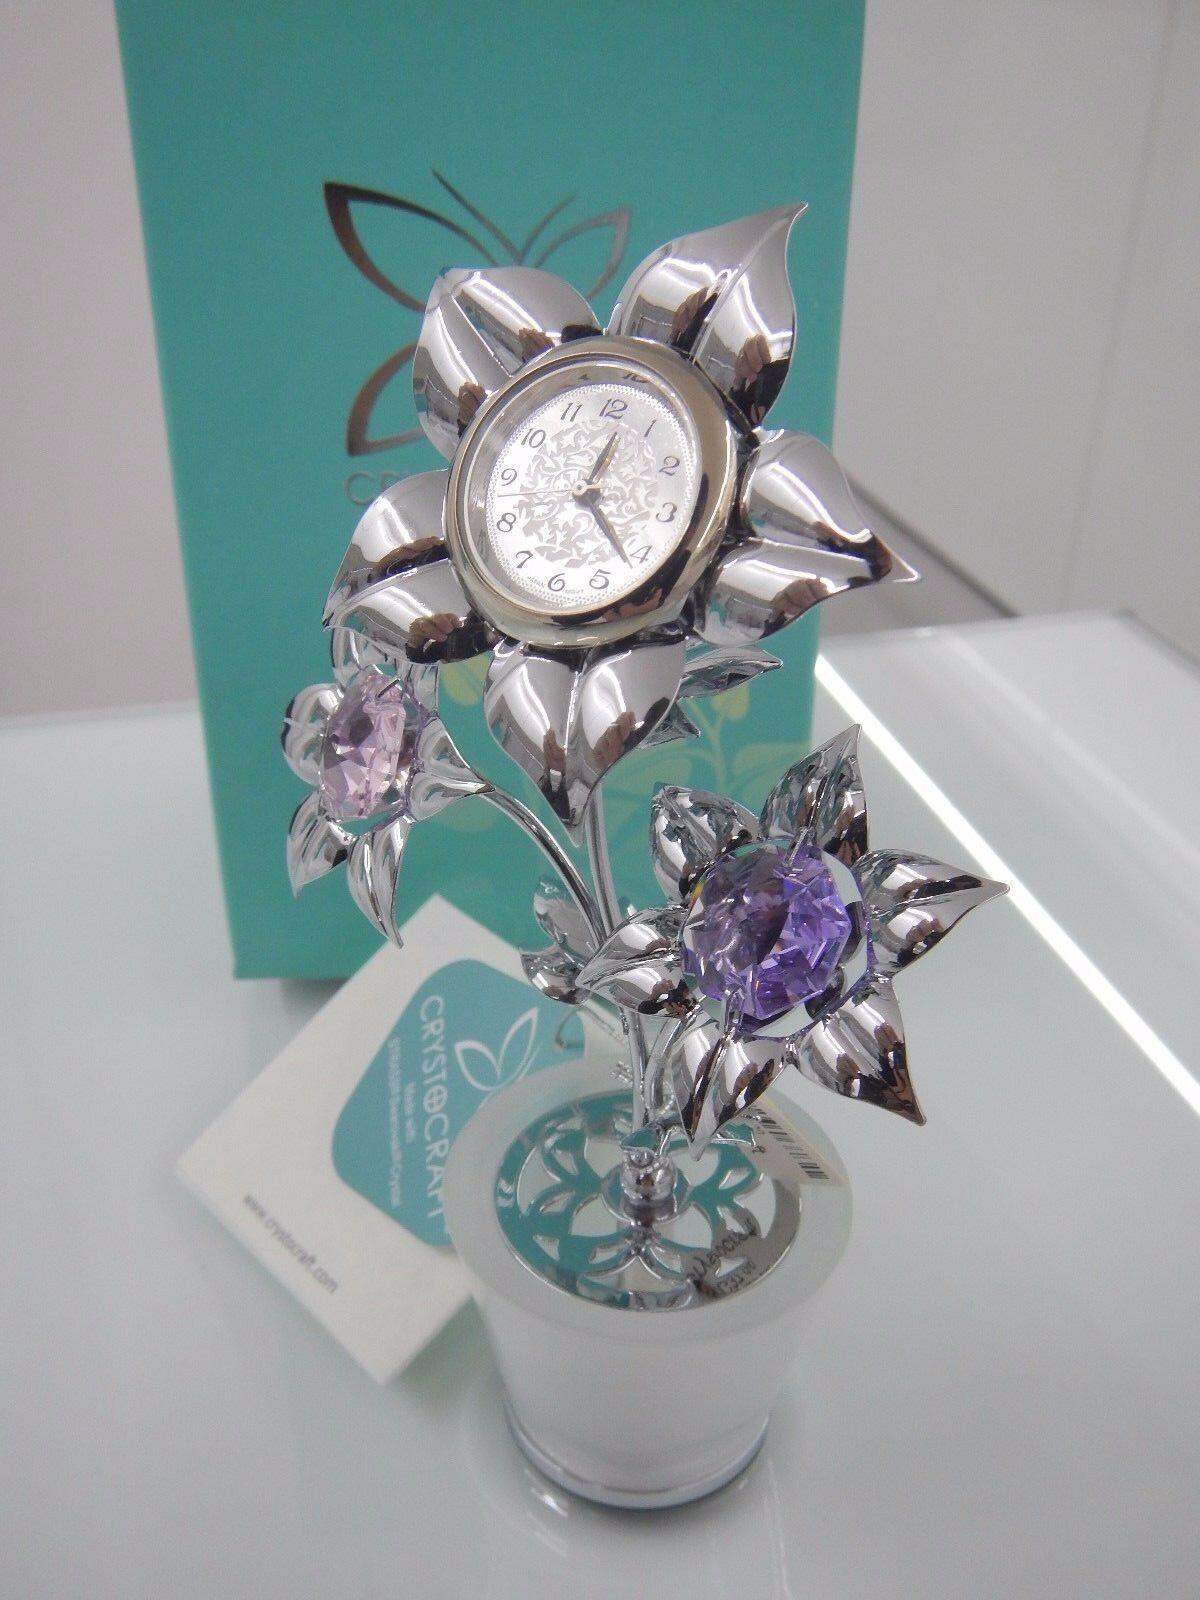 Tris fiore con orologio Crystocraft Cristalli Swarovski Original U0312-142-CM101